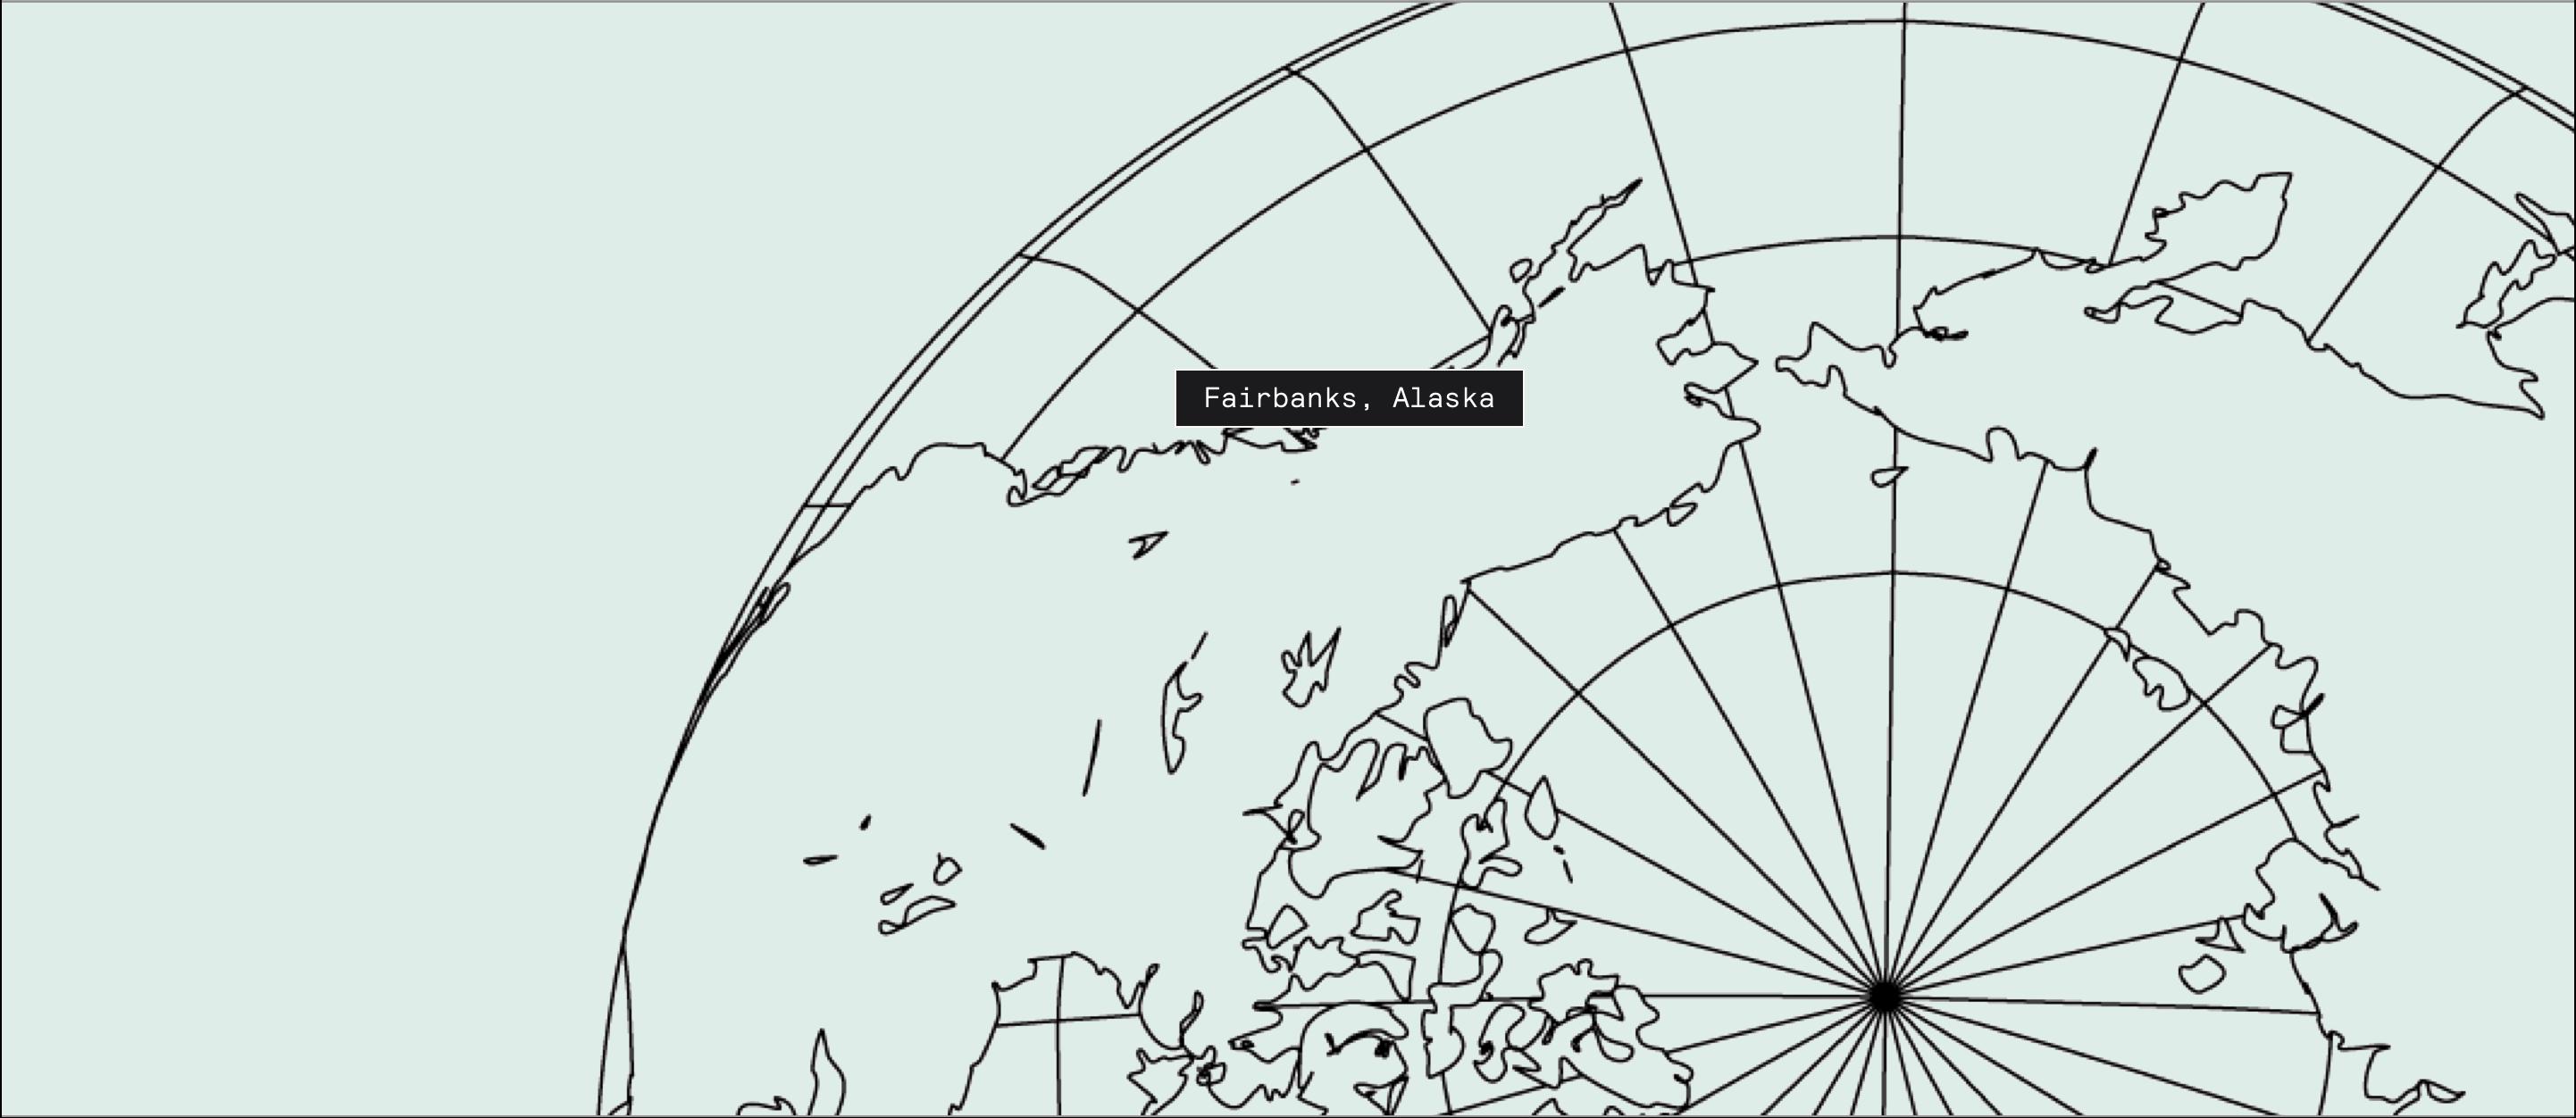 Fairbanks, Alaska on map